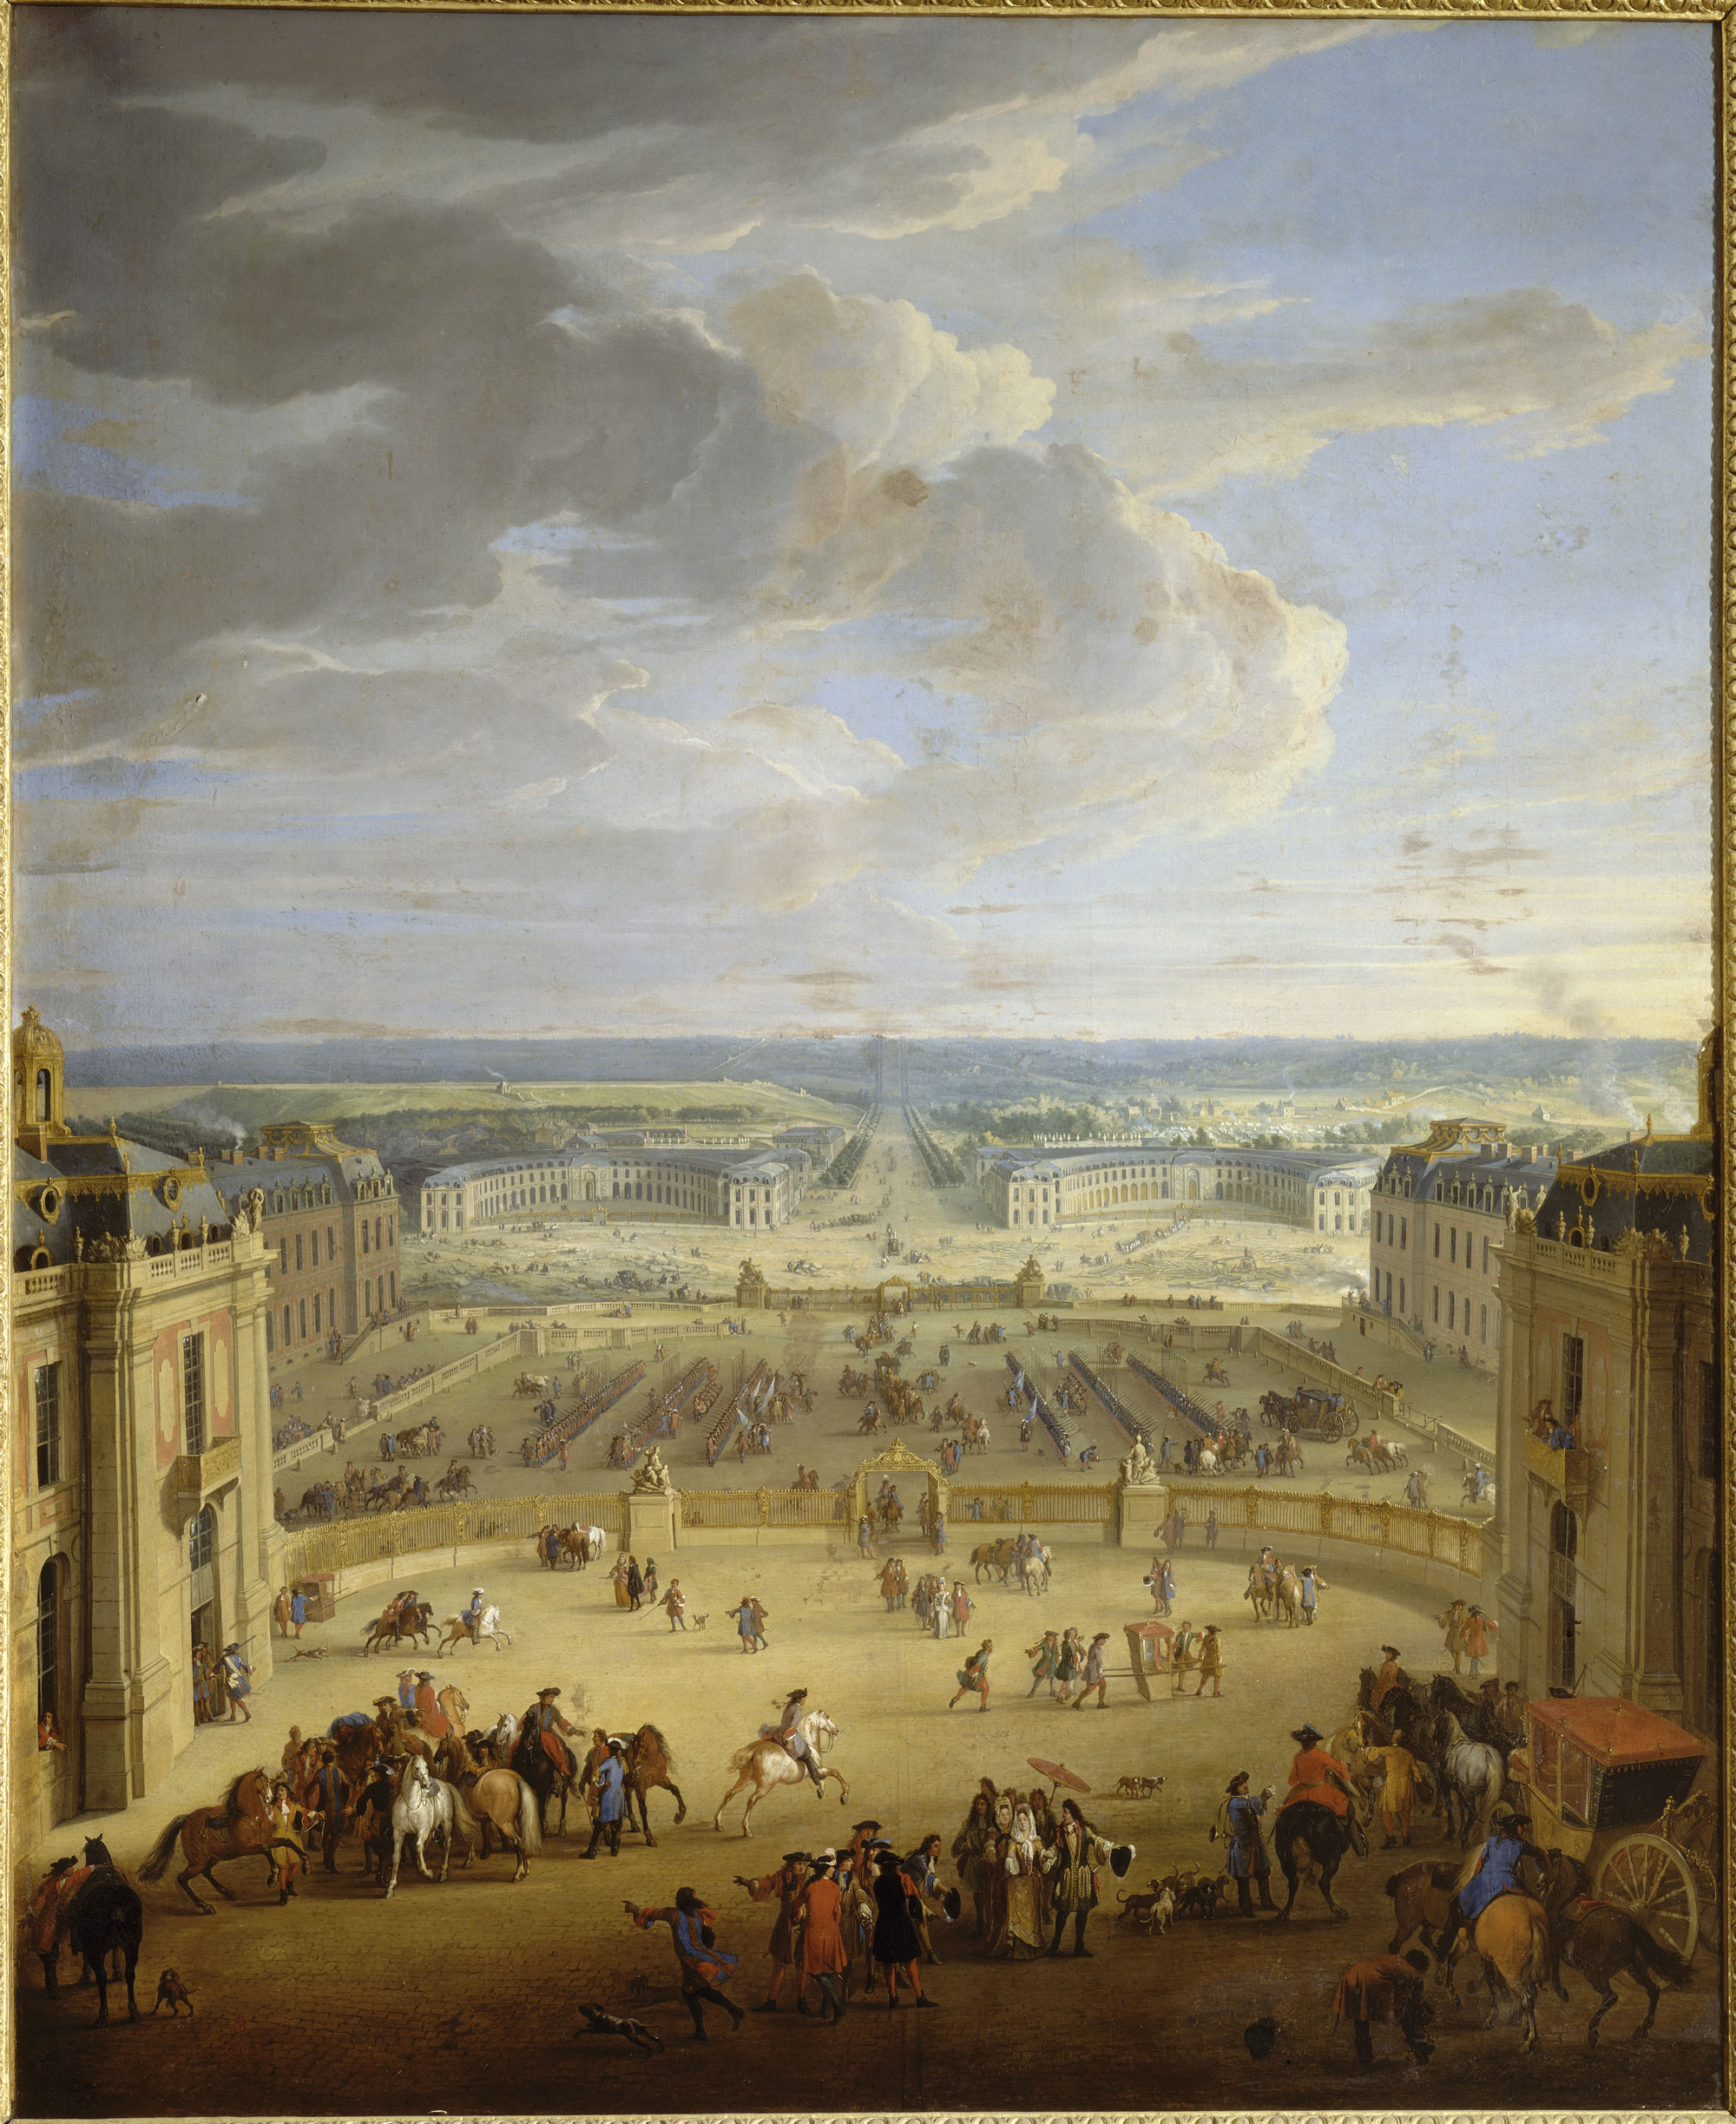 1682 - XVIIth century - Over the centuries - Versailles 3d